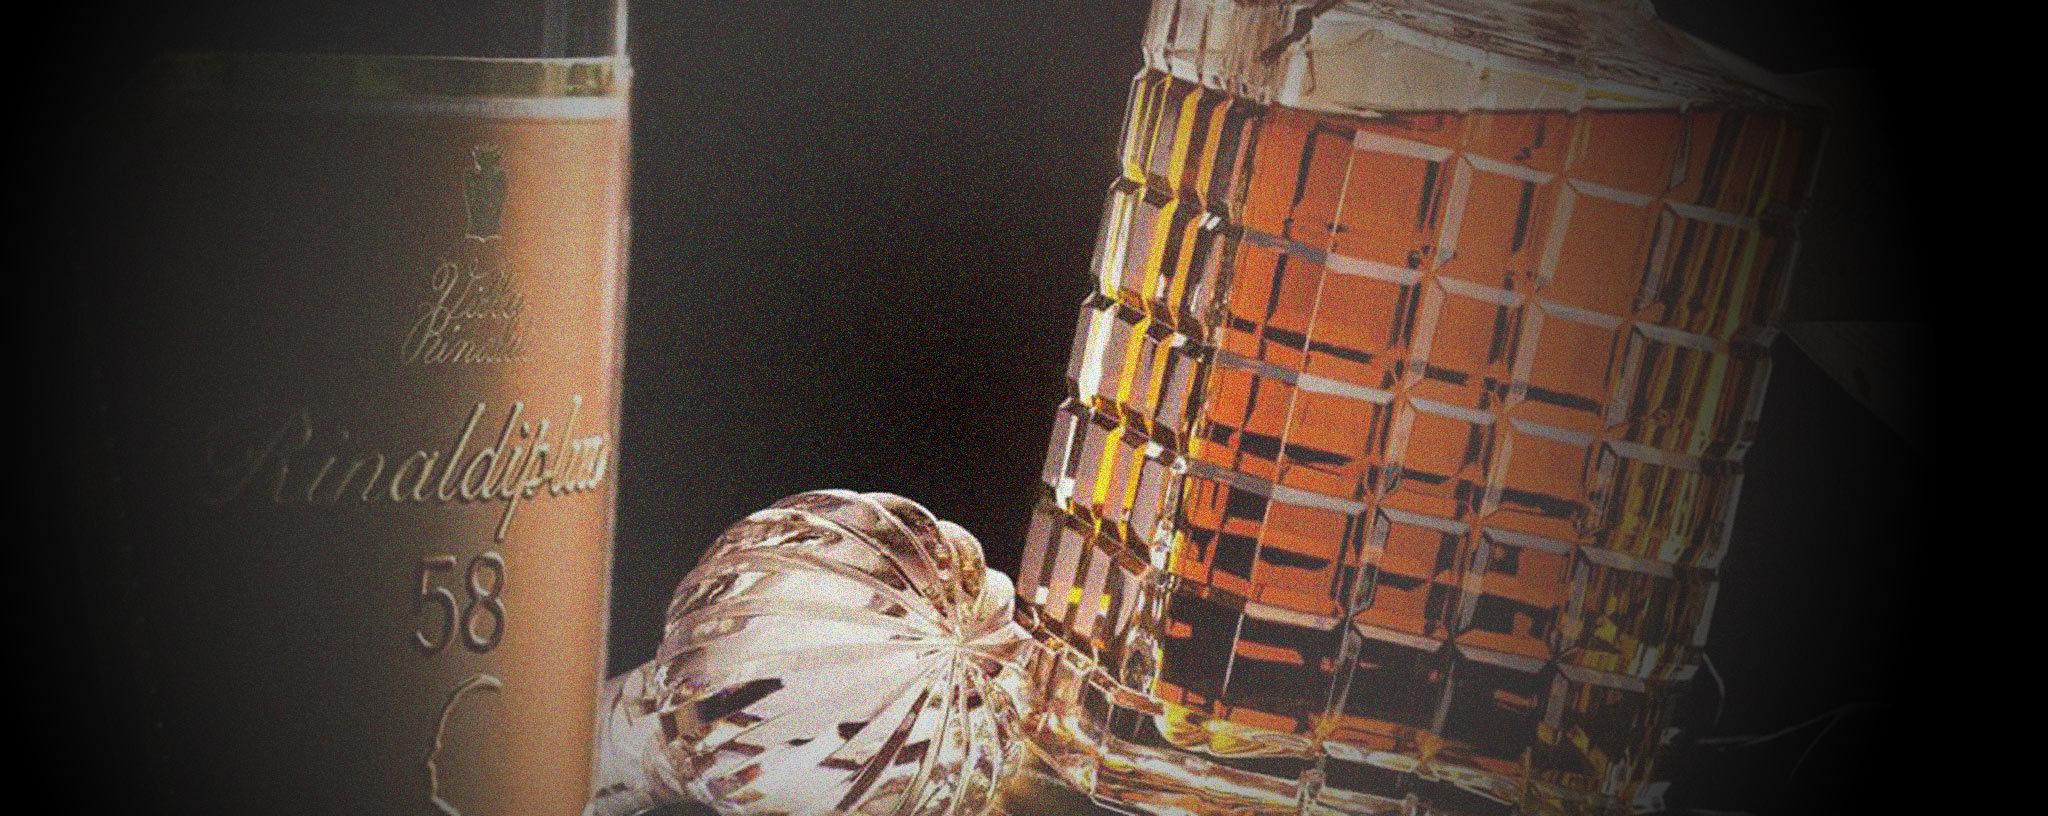 Distillate of Cuvees 58